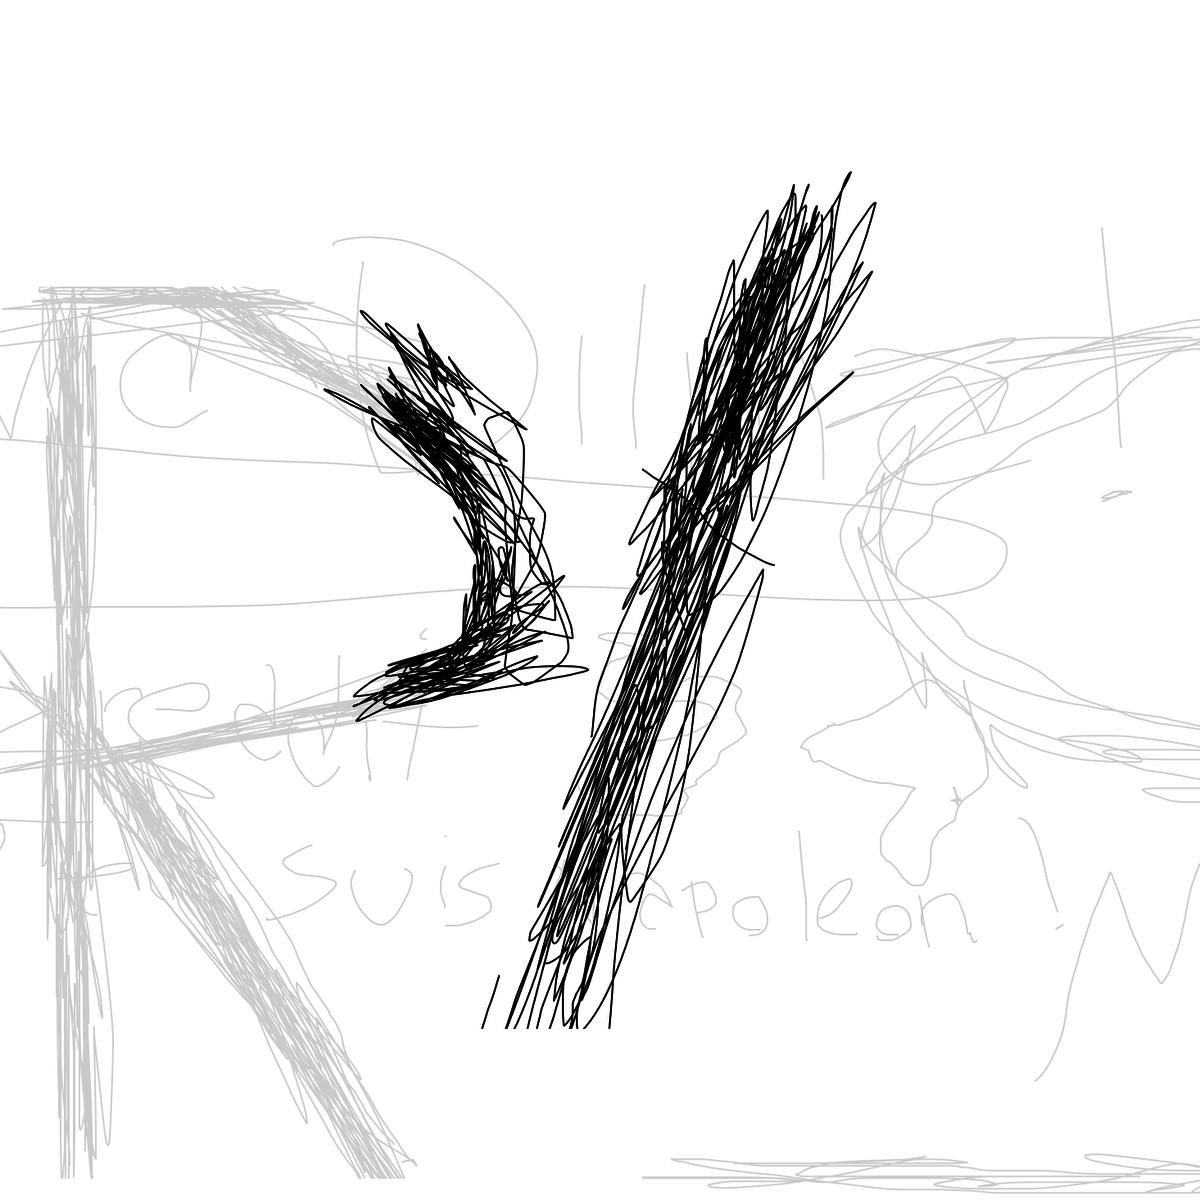 BAAAM drawing#7568 lat:-12.0500402450561520lng: -51.5040130615234400